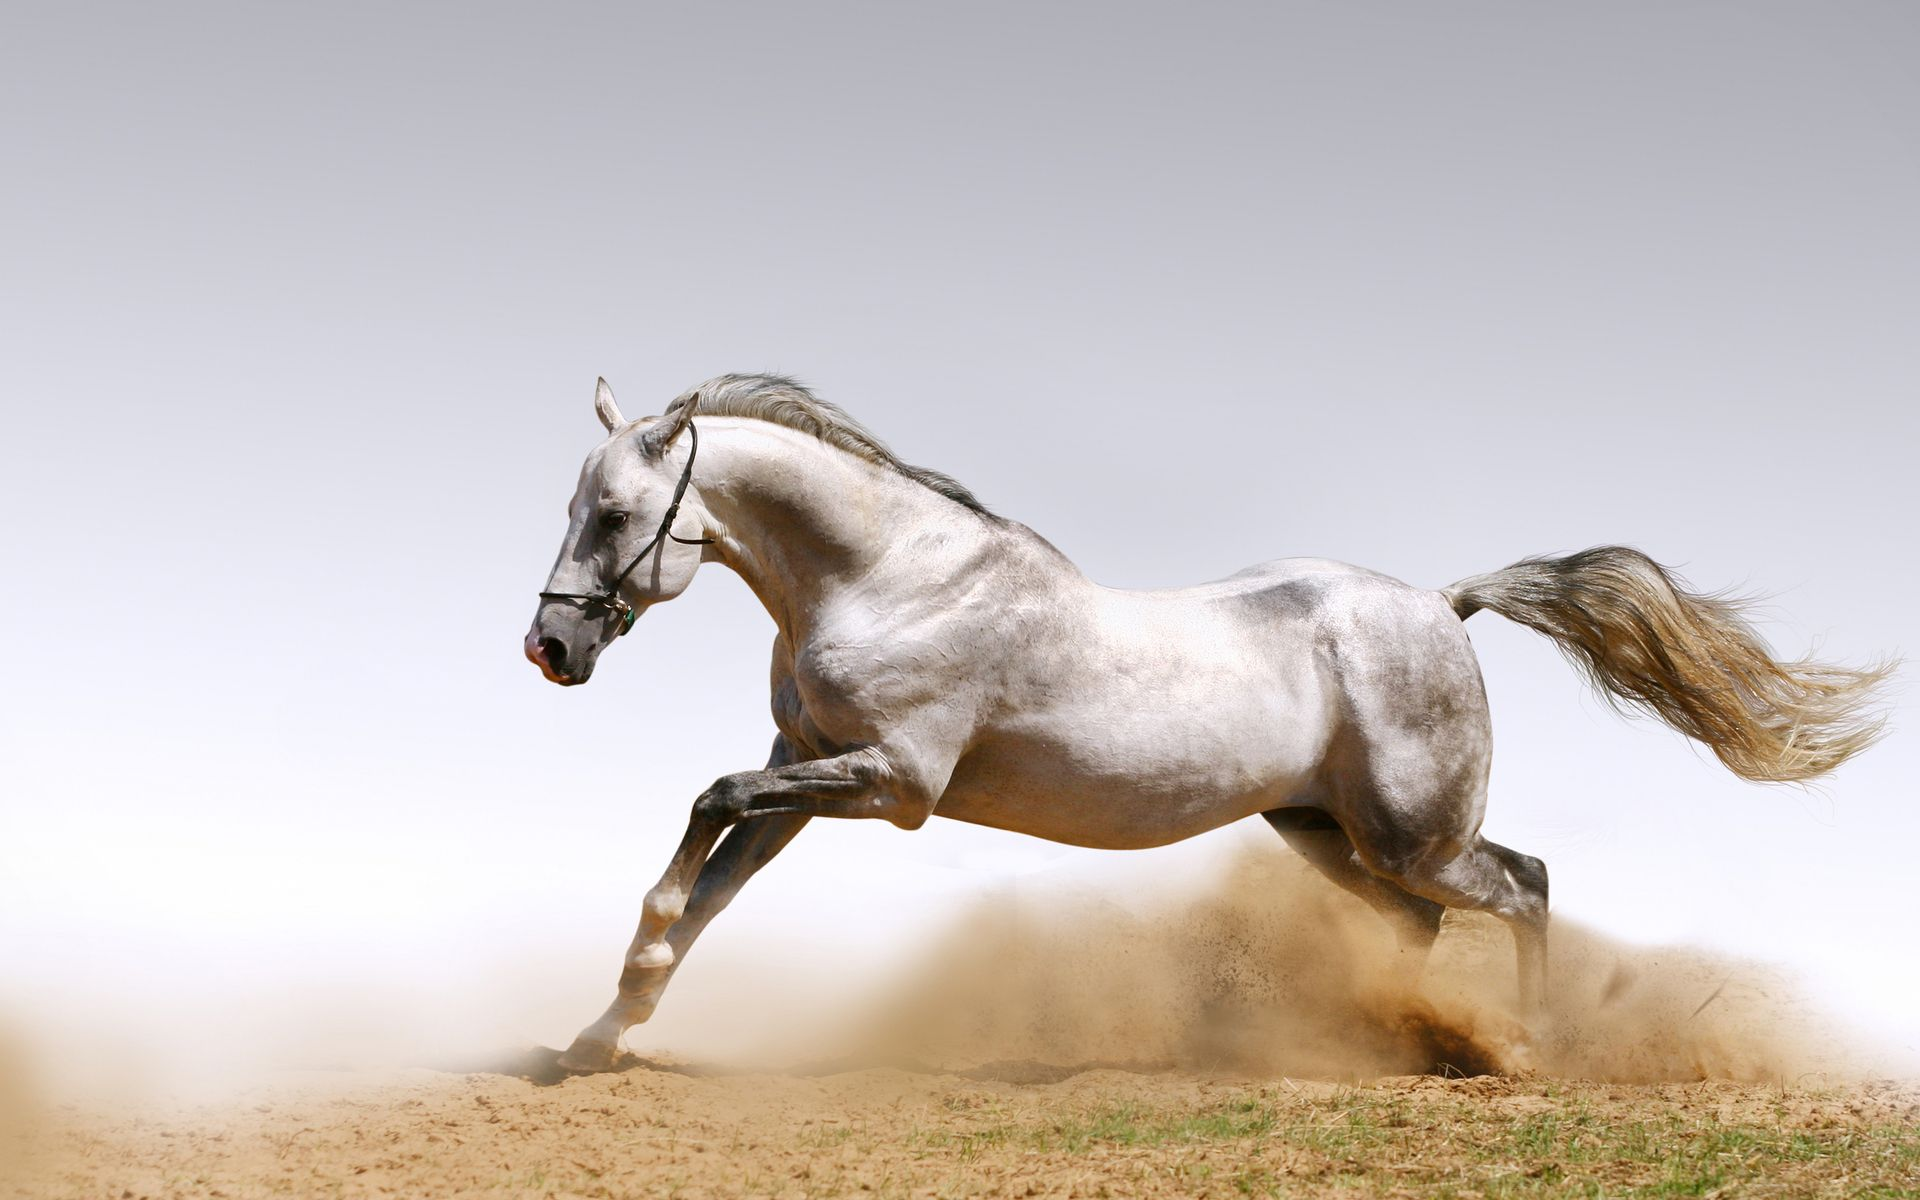 Best Wallpaper Horse Creative - 6a9f5057d9ed7878c345d74f2b436ba0  Image_639218.jpg